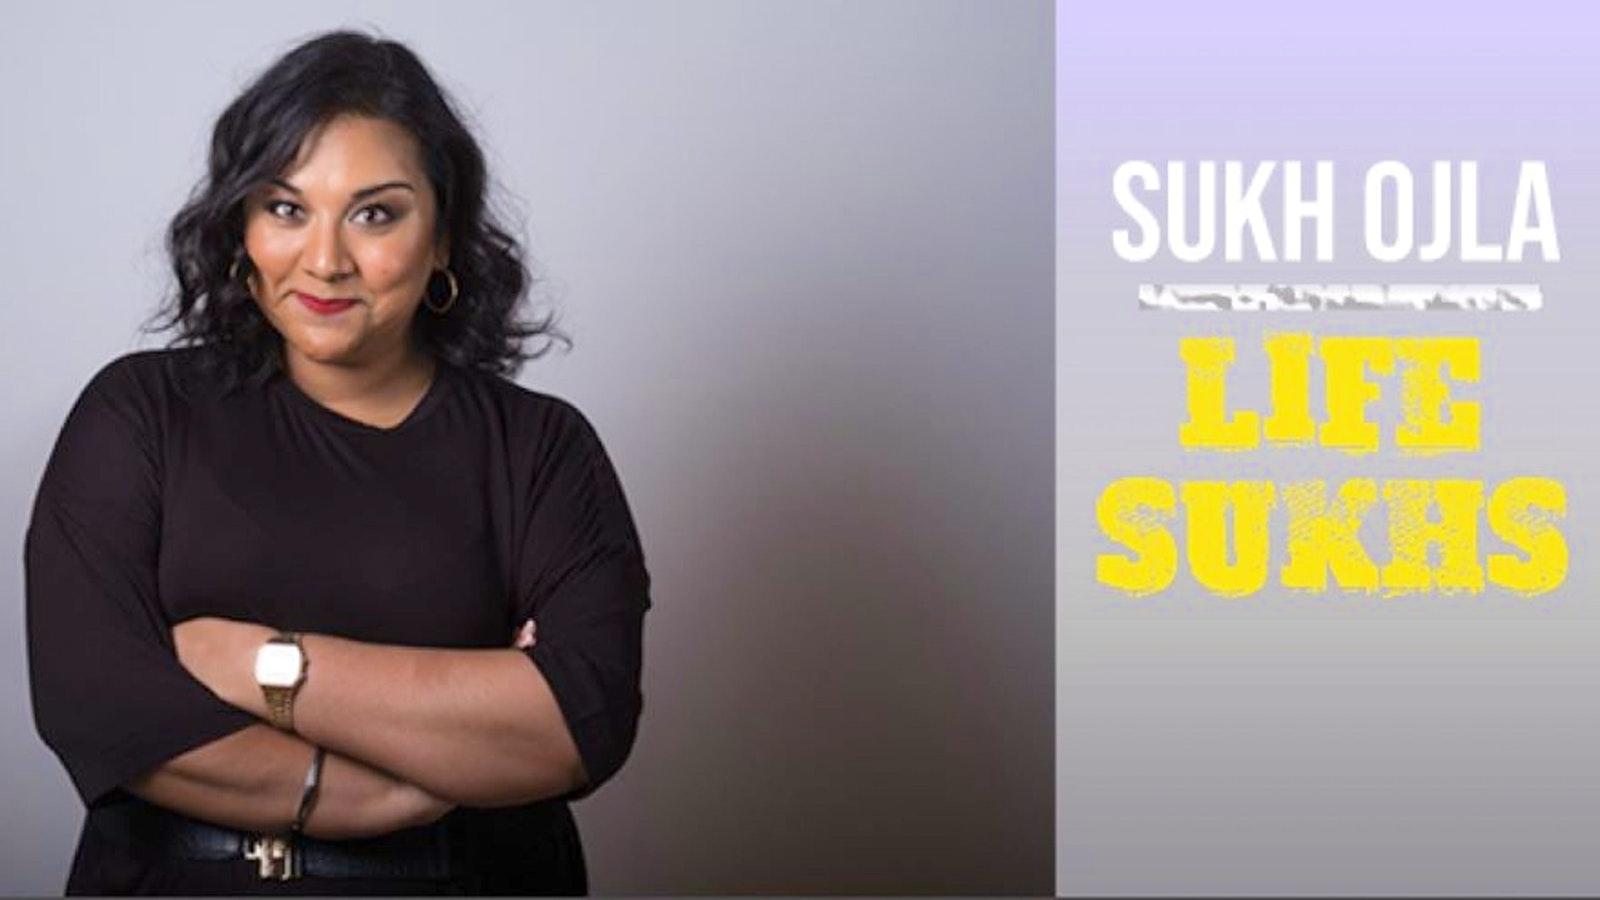 Sukh Ojla : Life Sukhs – Solihull